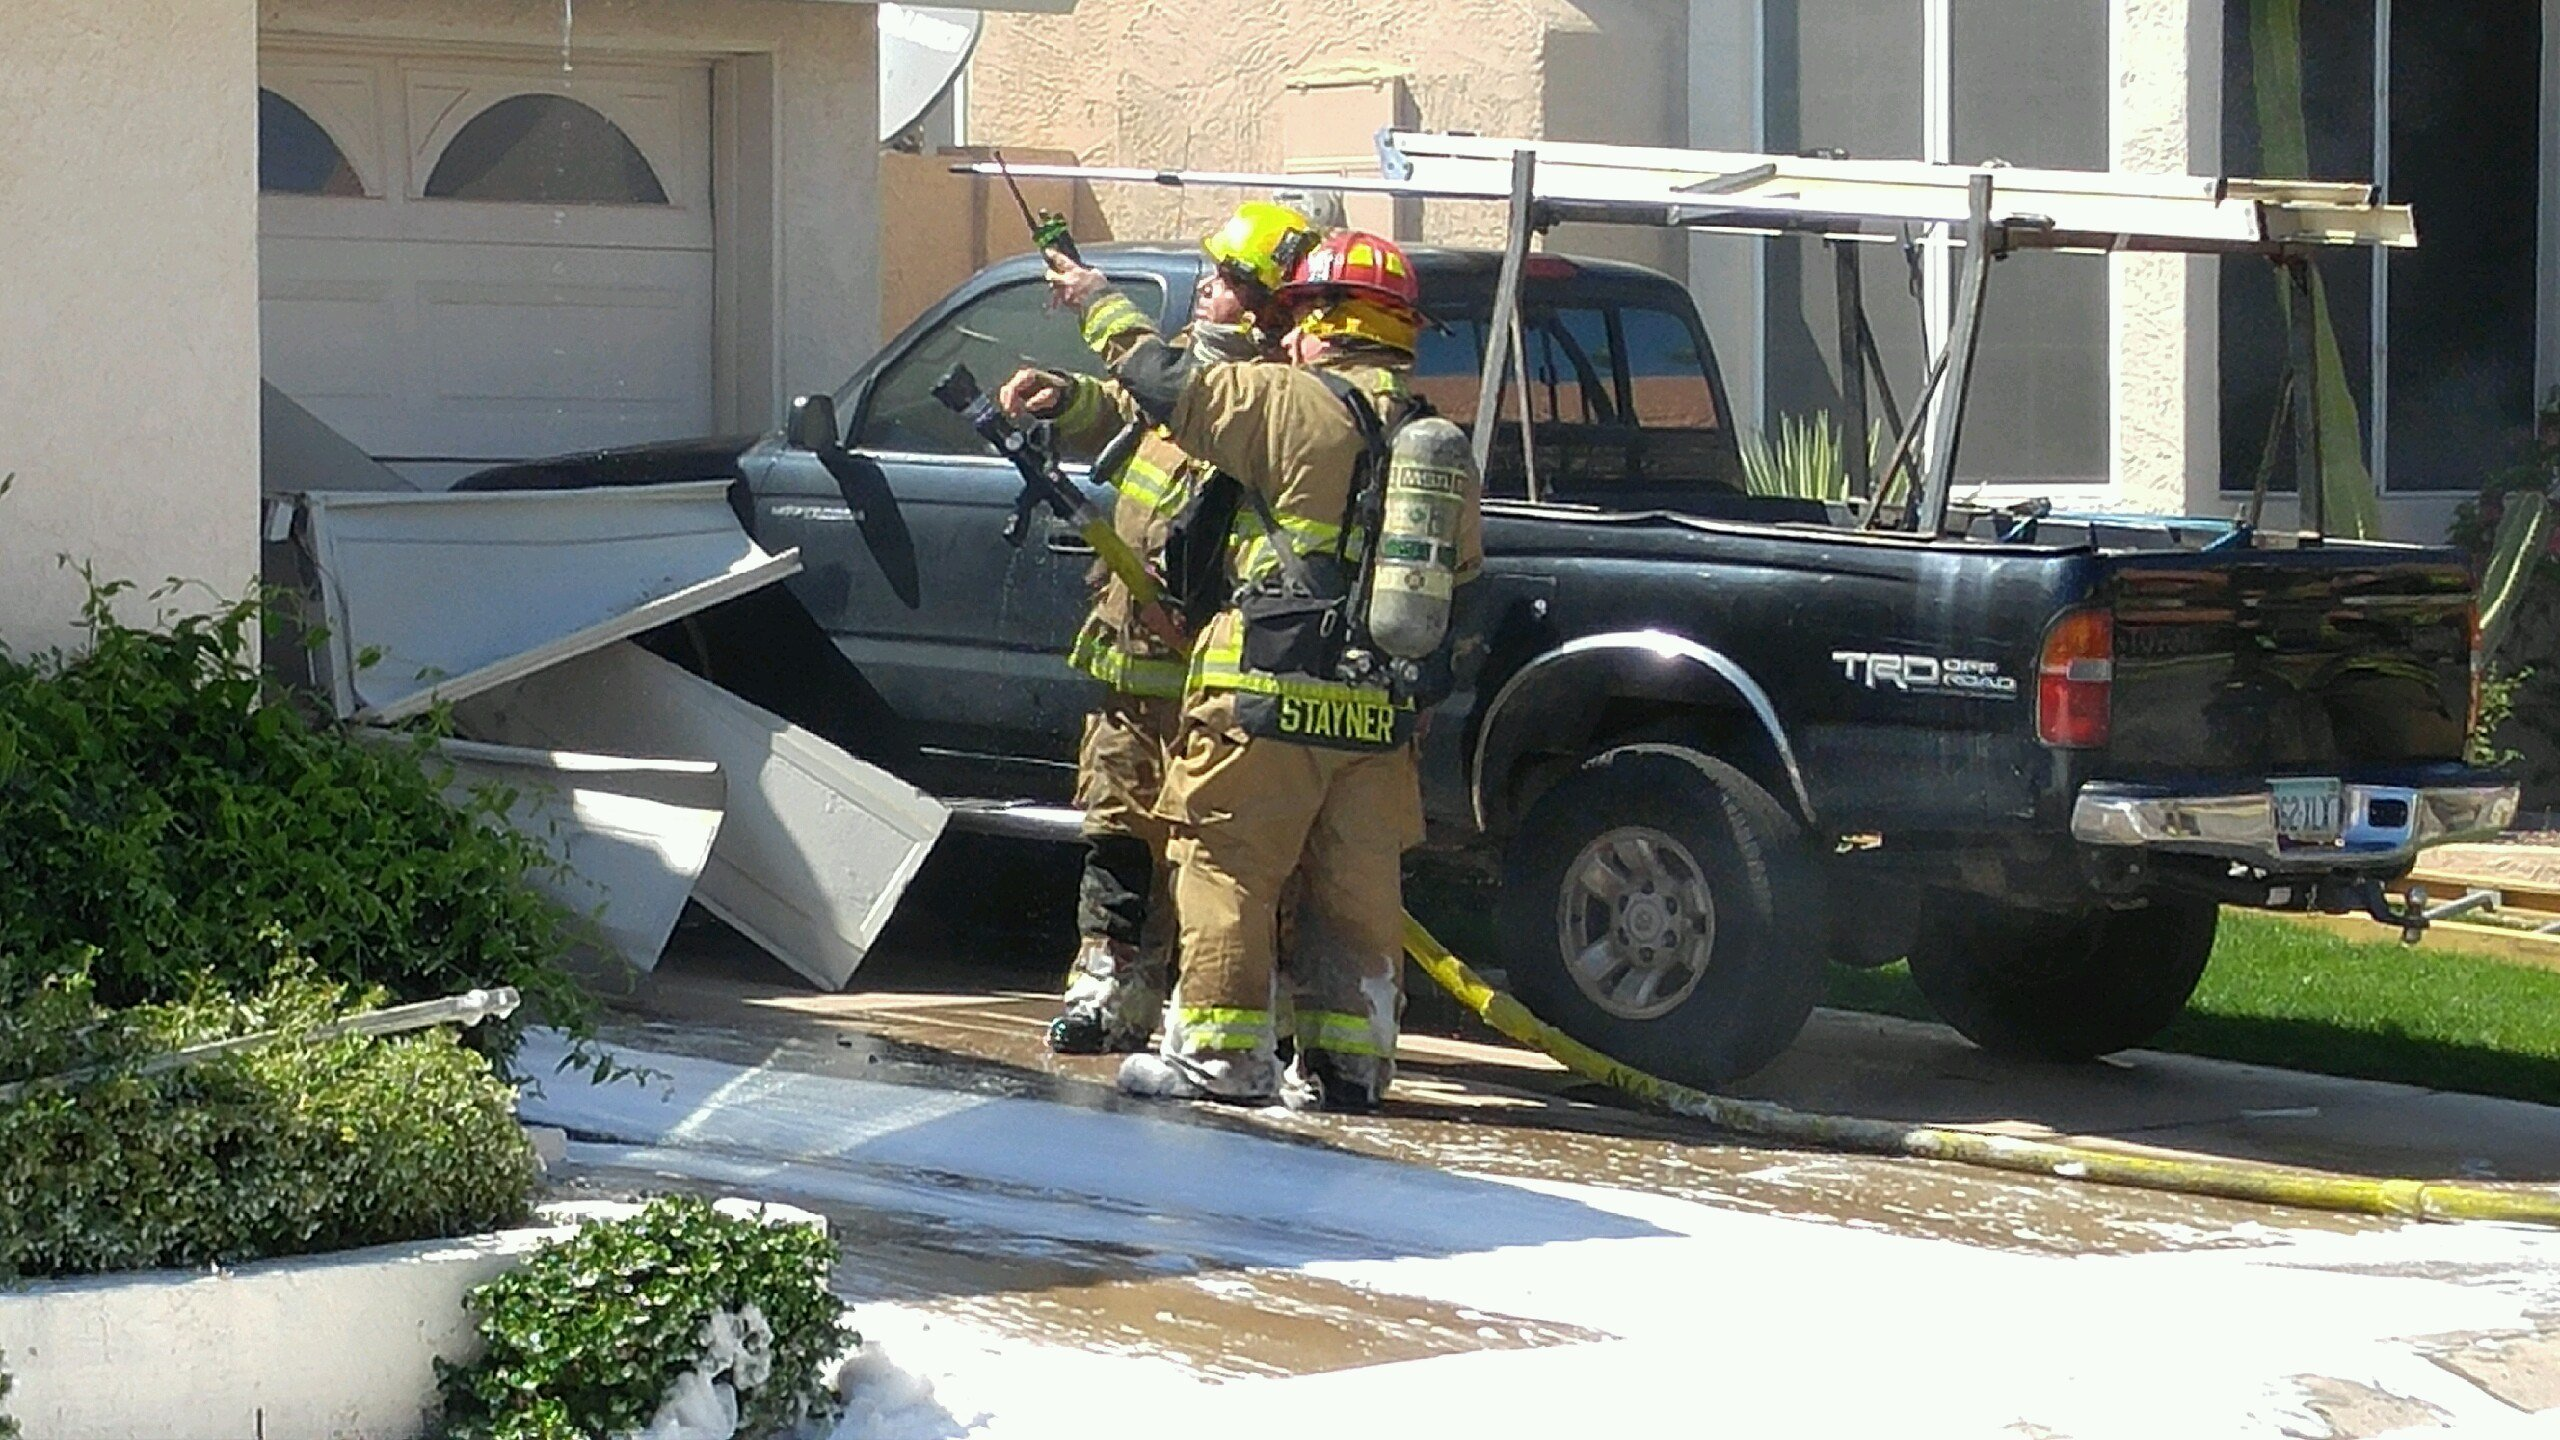 Phoenix Firefighters work on hot spots on a house fire Sunday.  19 March 2017[SOURCE: 3TV/CBS5 News]